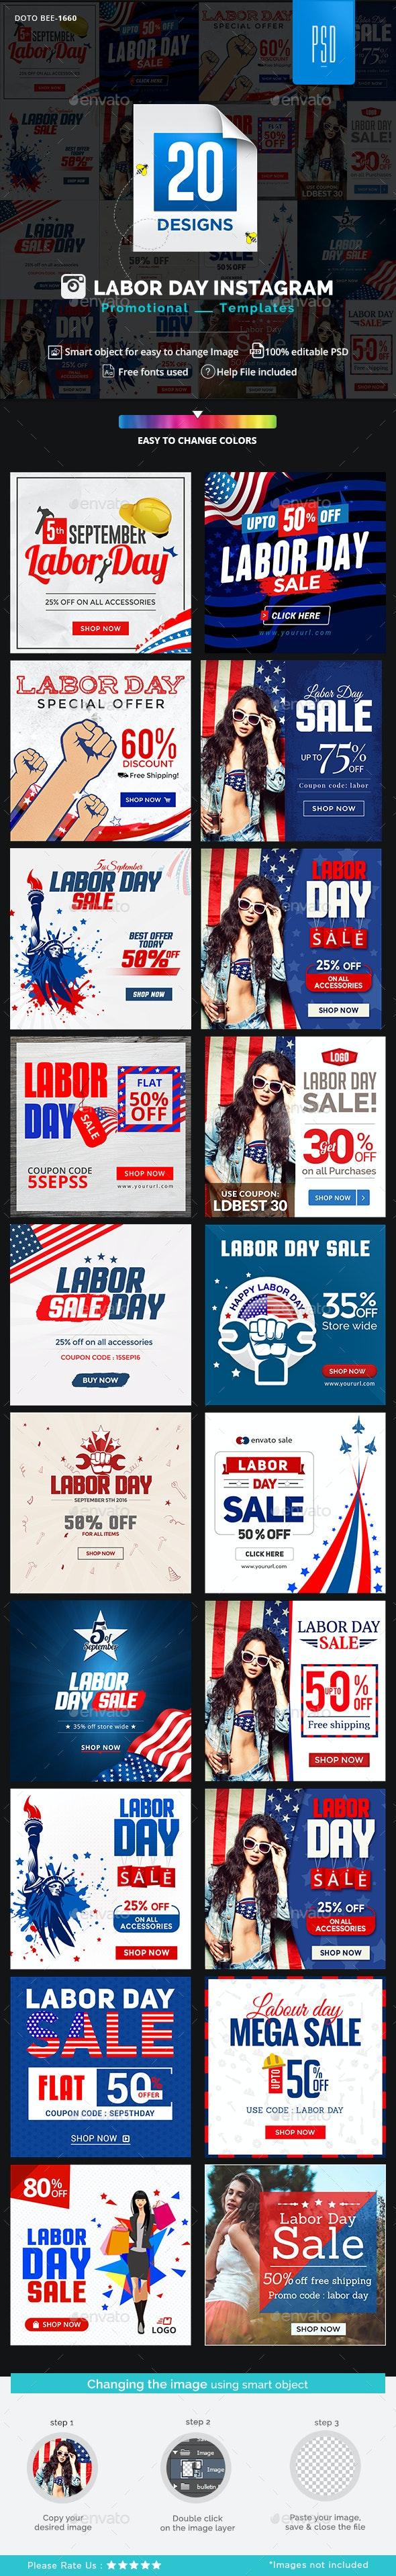 Labor Day Instagram Templates - 20 designs - Miscellaneous Social Media